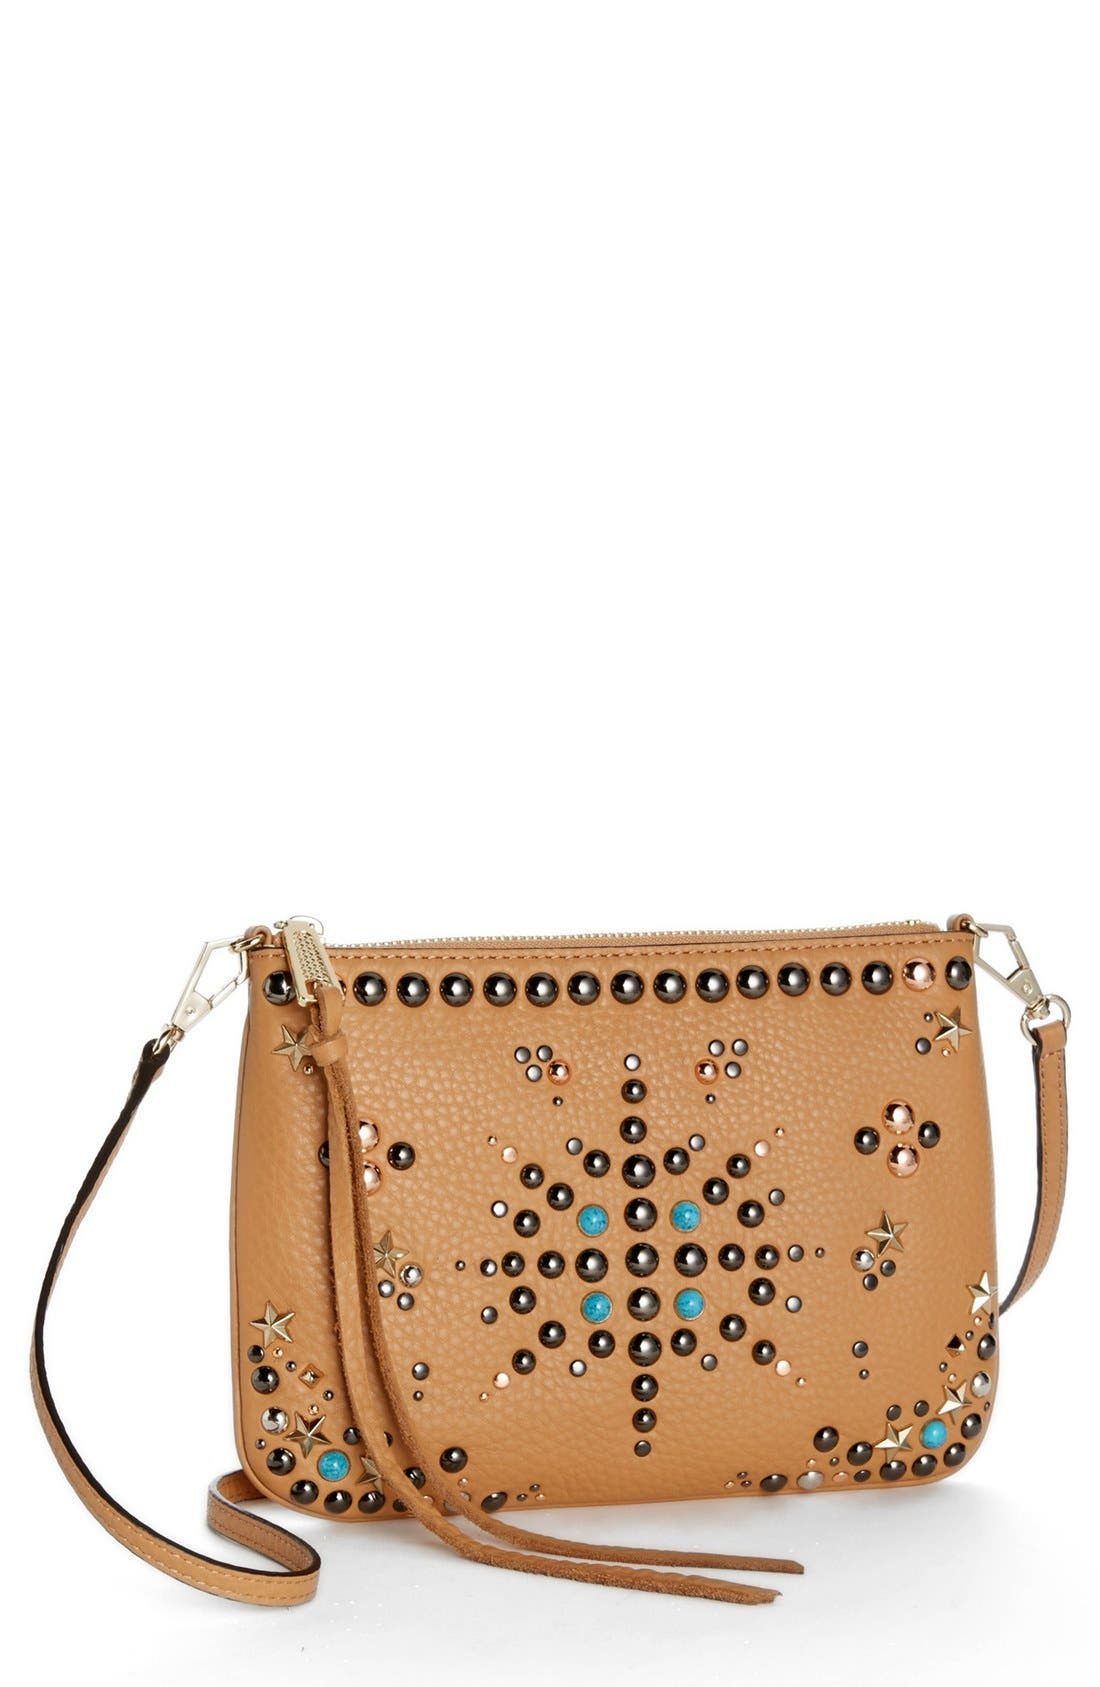 Alternate Image 1 Selected - Rebecca Minkoff 'Ascher' Crossbody Bag